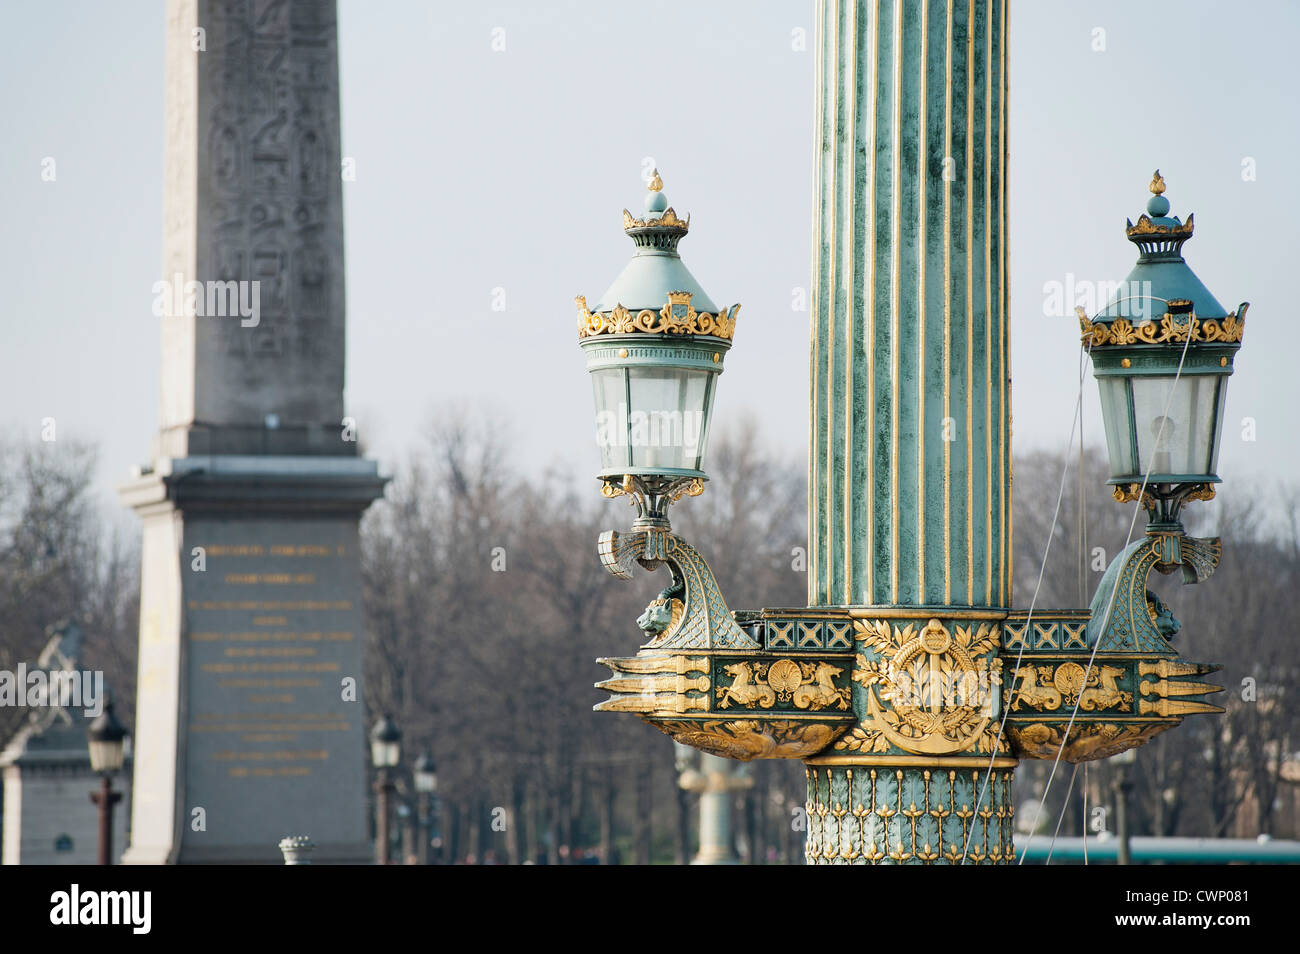 Ornate lamp post in Place de la Condorde, Paris, France - Stock Image